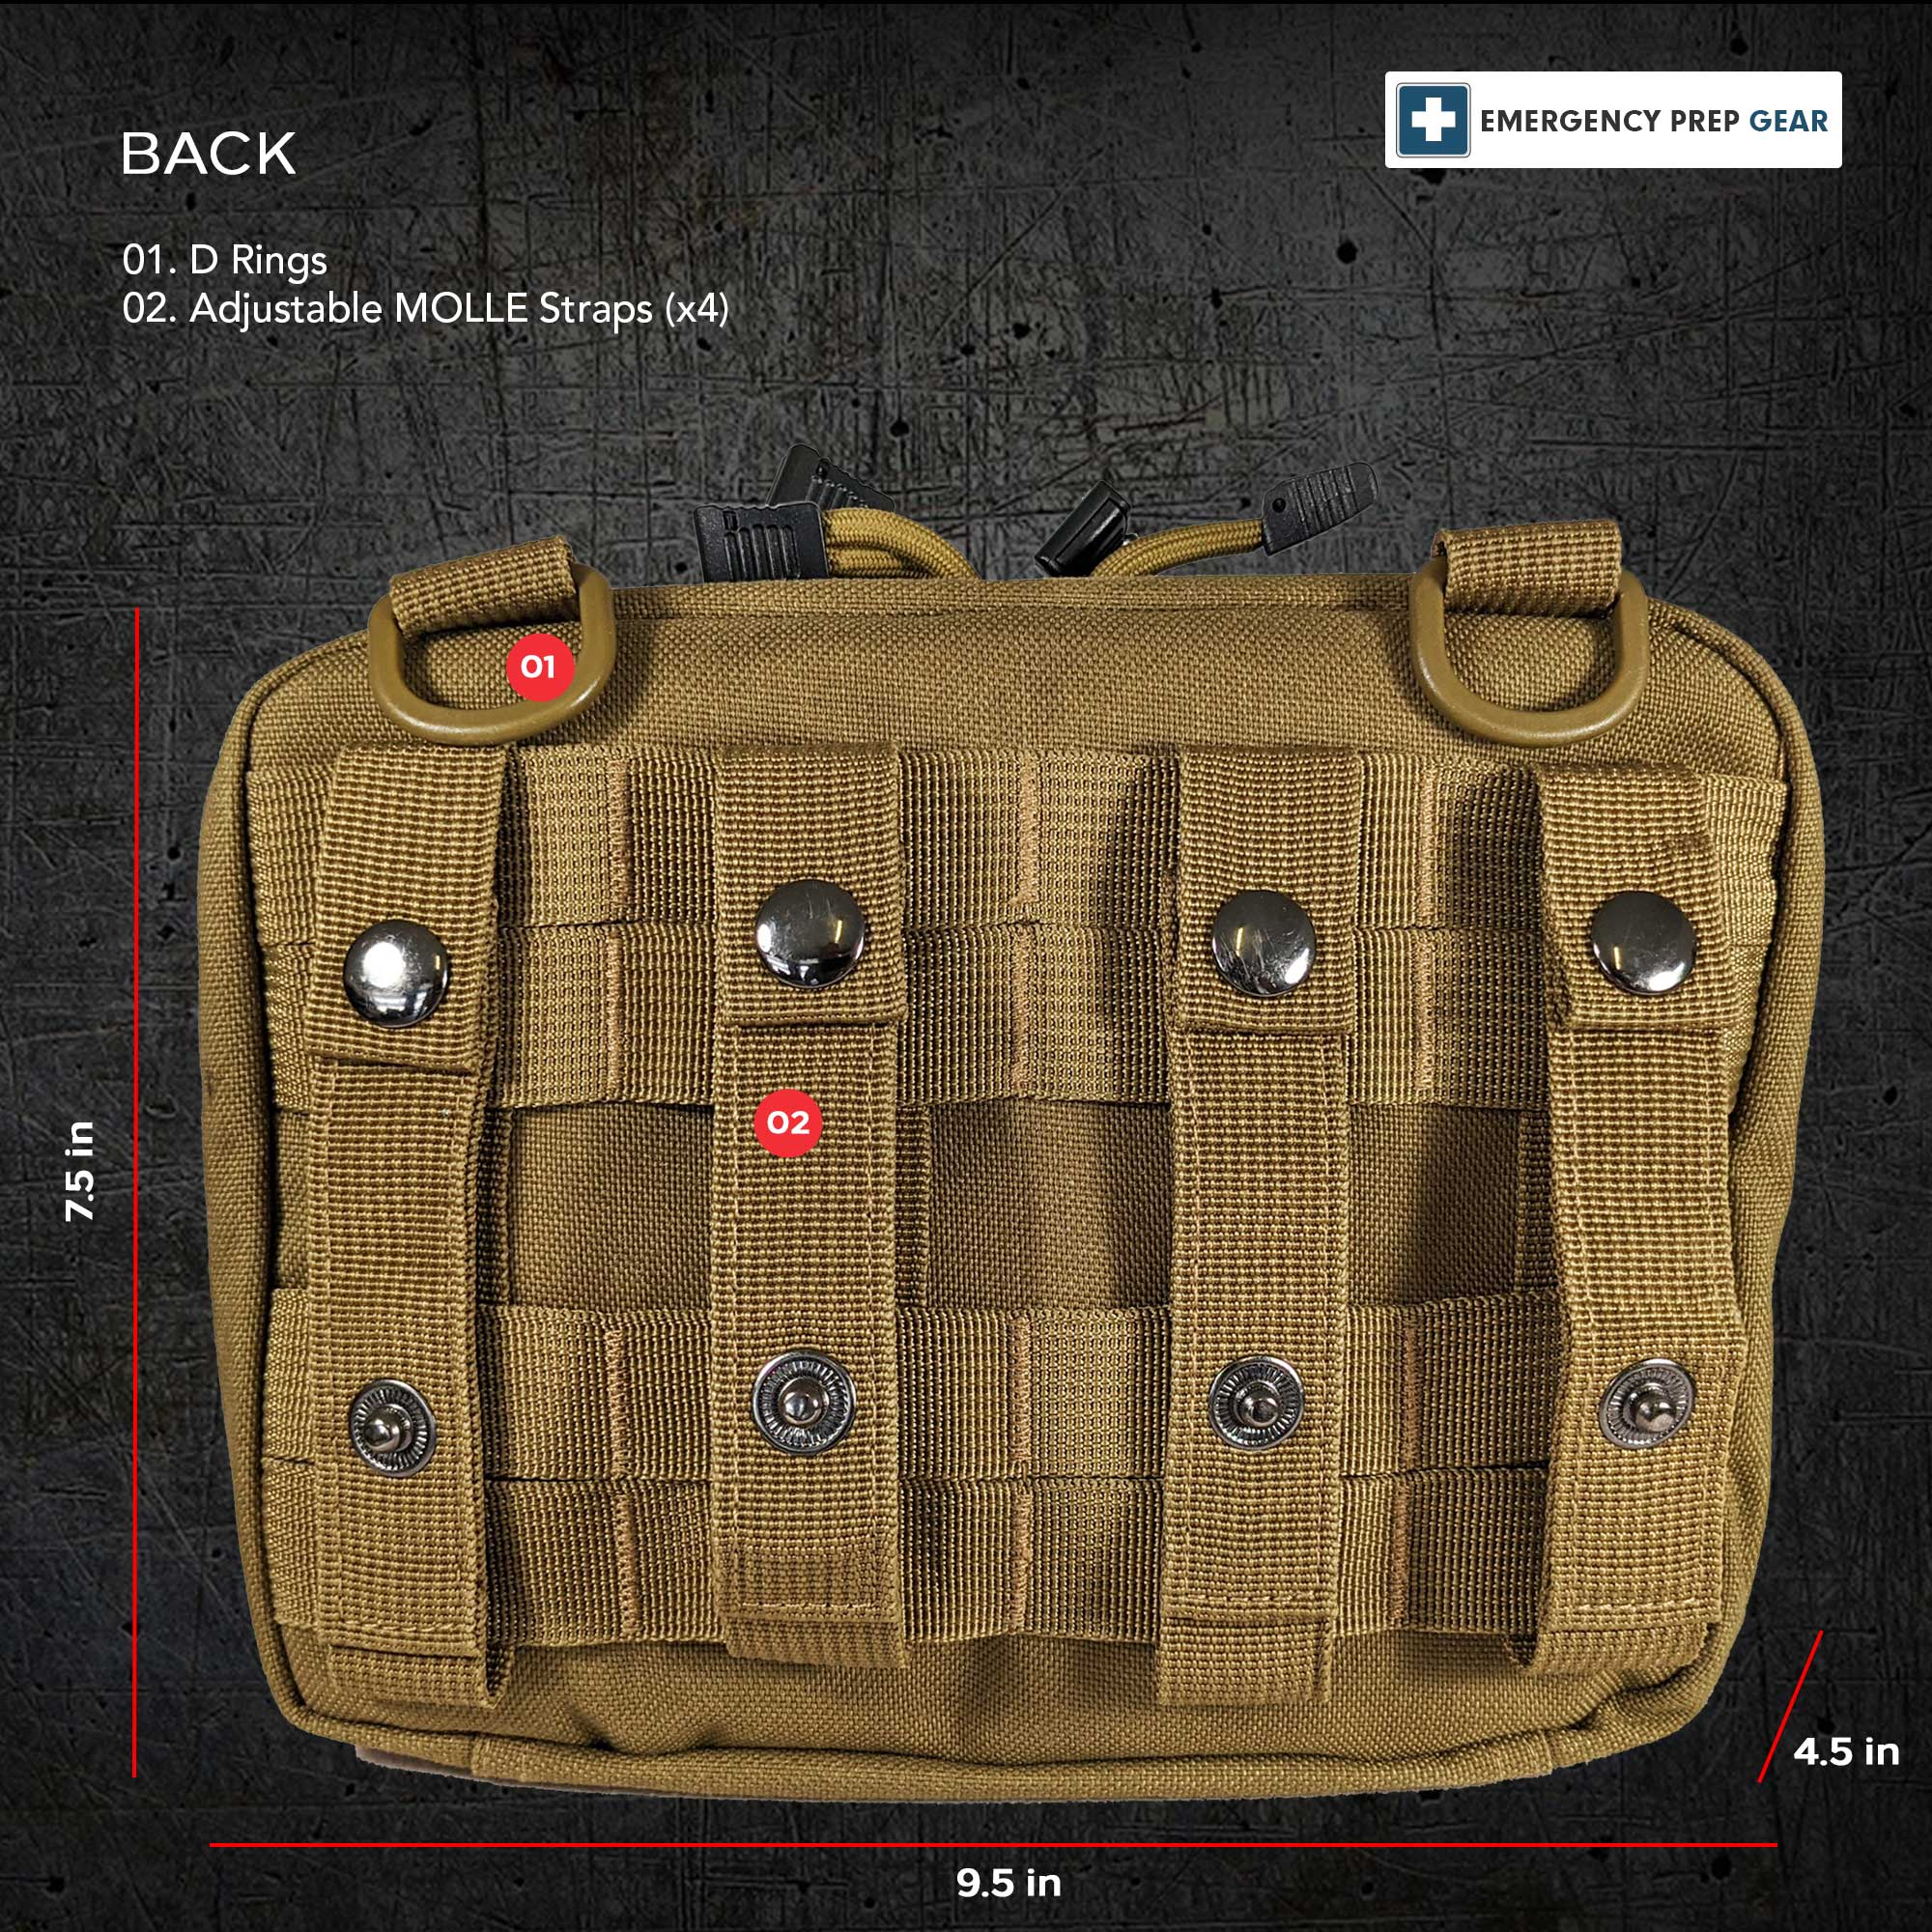 21 10 01 14 38 50 original b09dqz9vnl epg gear tan back